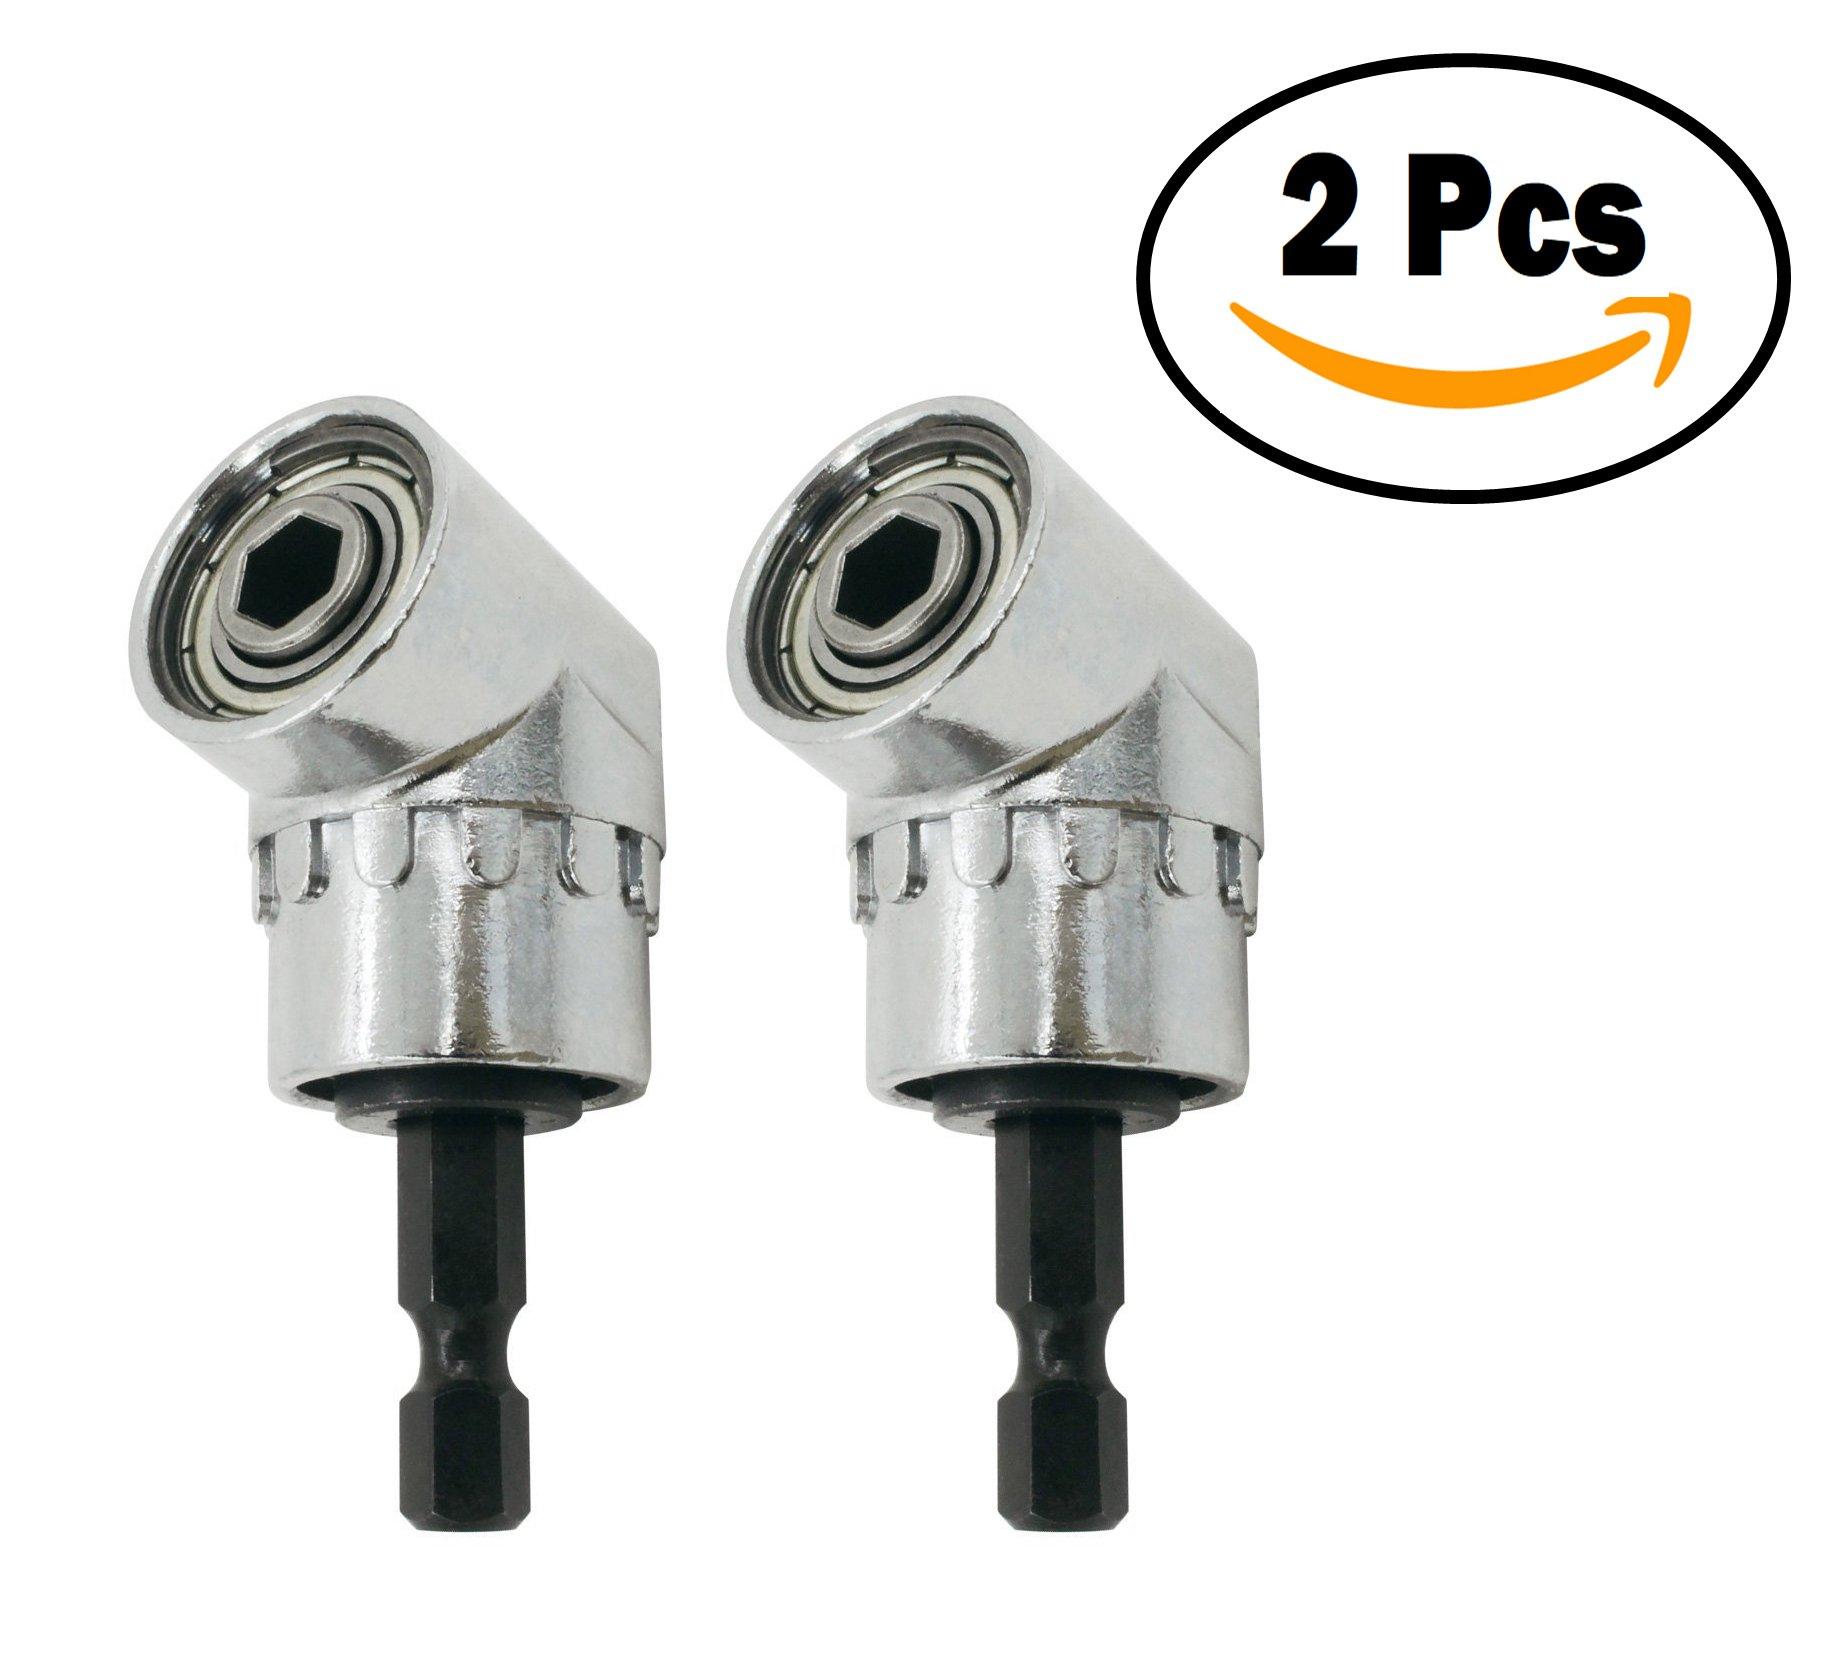 Angle Bit Holder 105 Degree 1/4 Inch 6mm Extension Adjustable Hex Drill Bit Angle Driver Screwdriver Socket Bit Holder Adaptor Tools (2 Pcs)